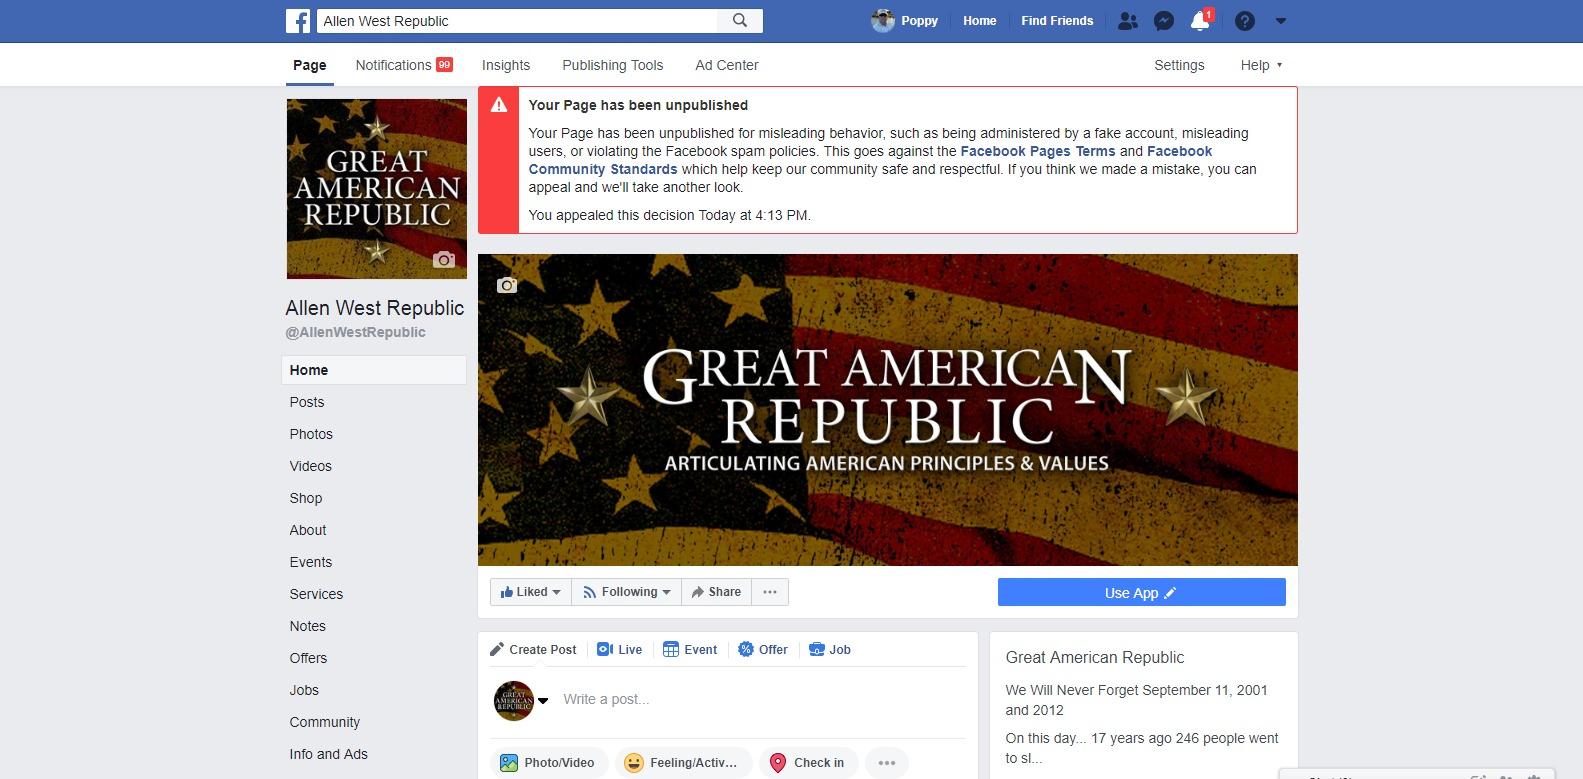 Facebook Great American Republic